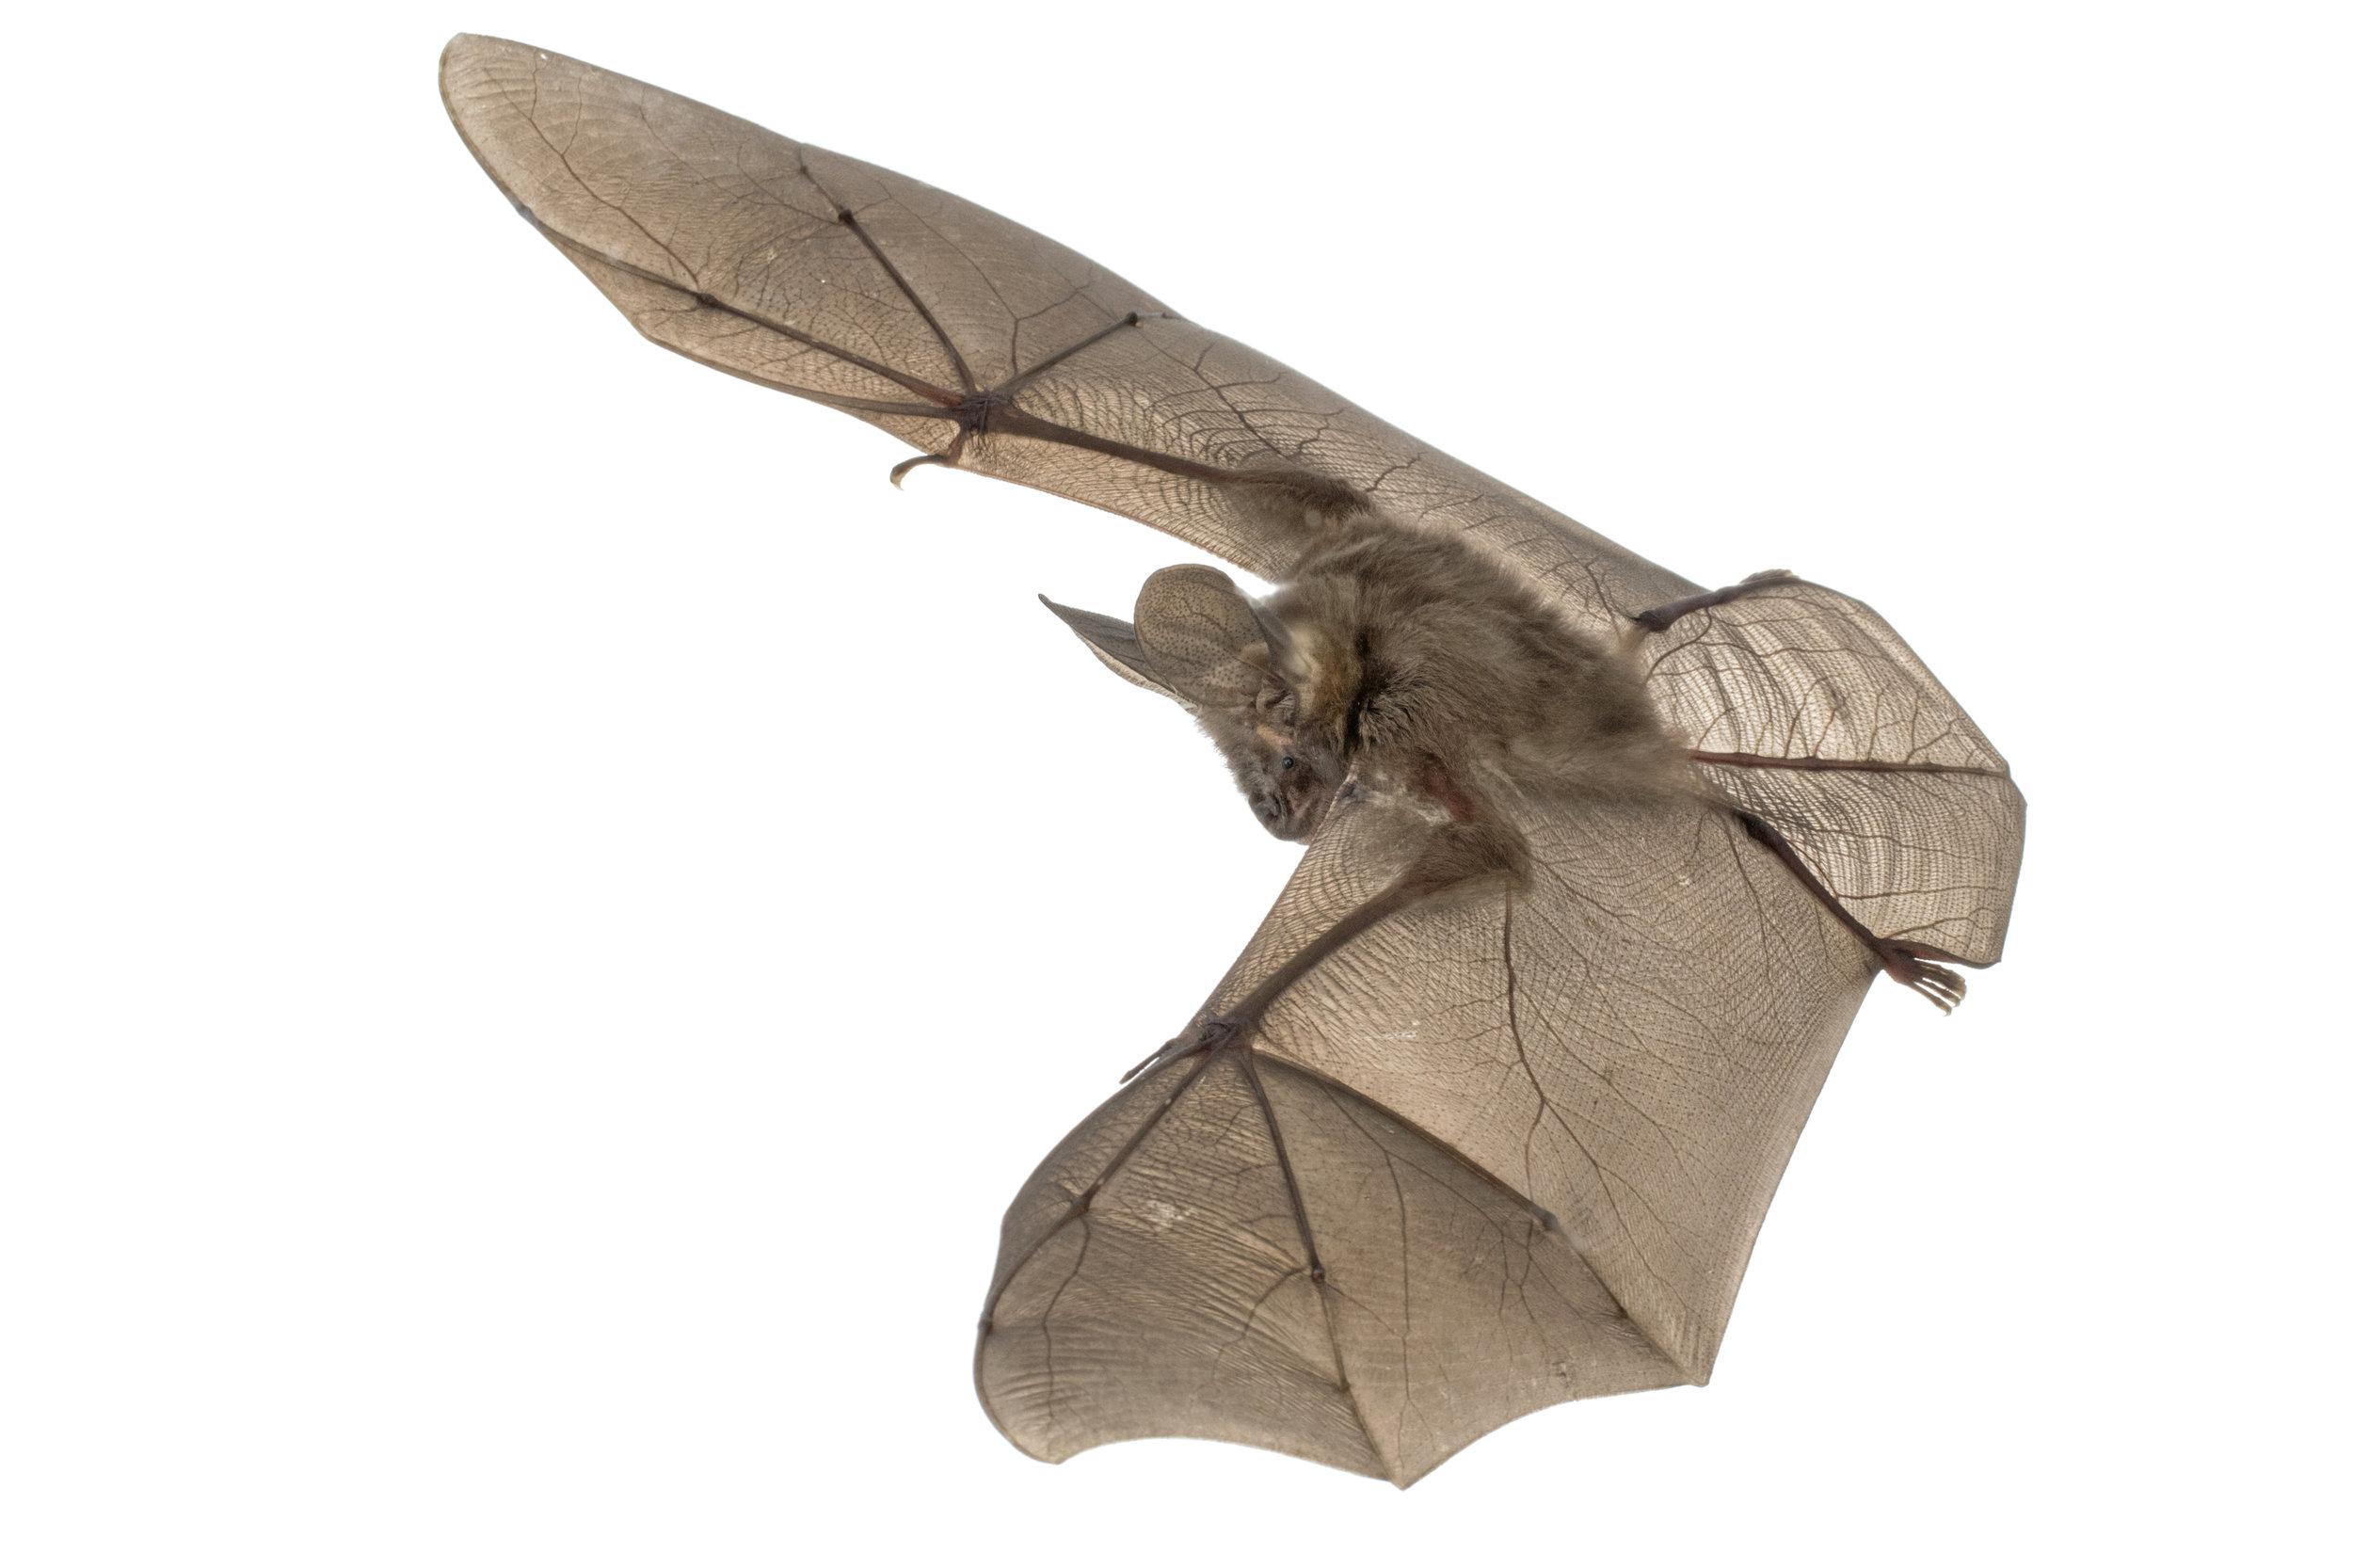 Large-eared whispering bat (Nycteris macrotis).